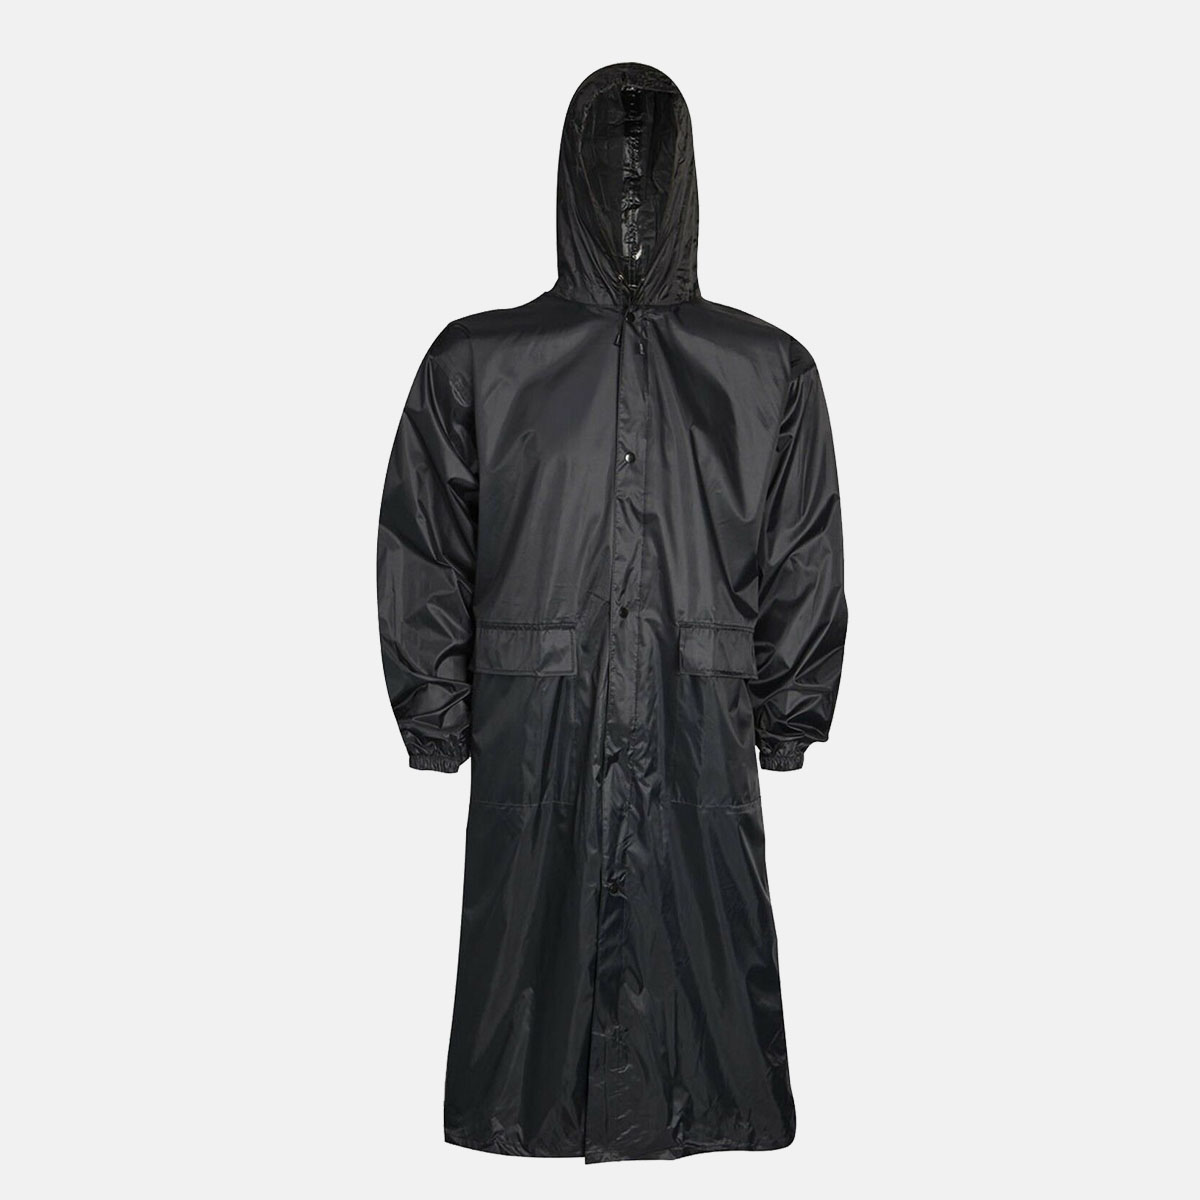 Adults Black Waterproof Long Coat by Baum Country